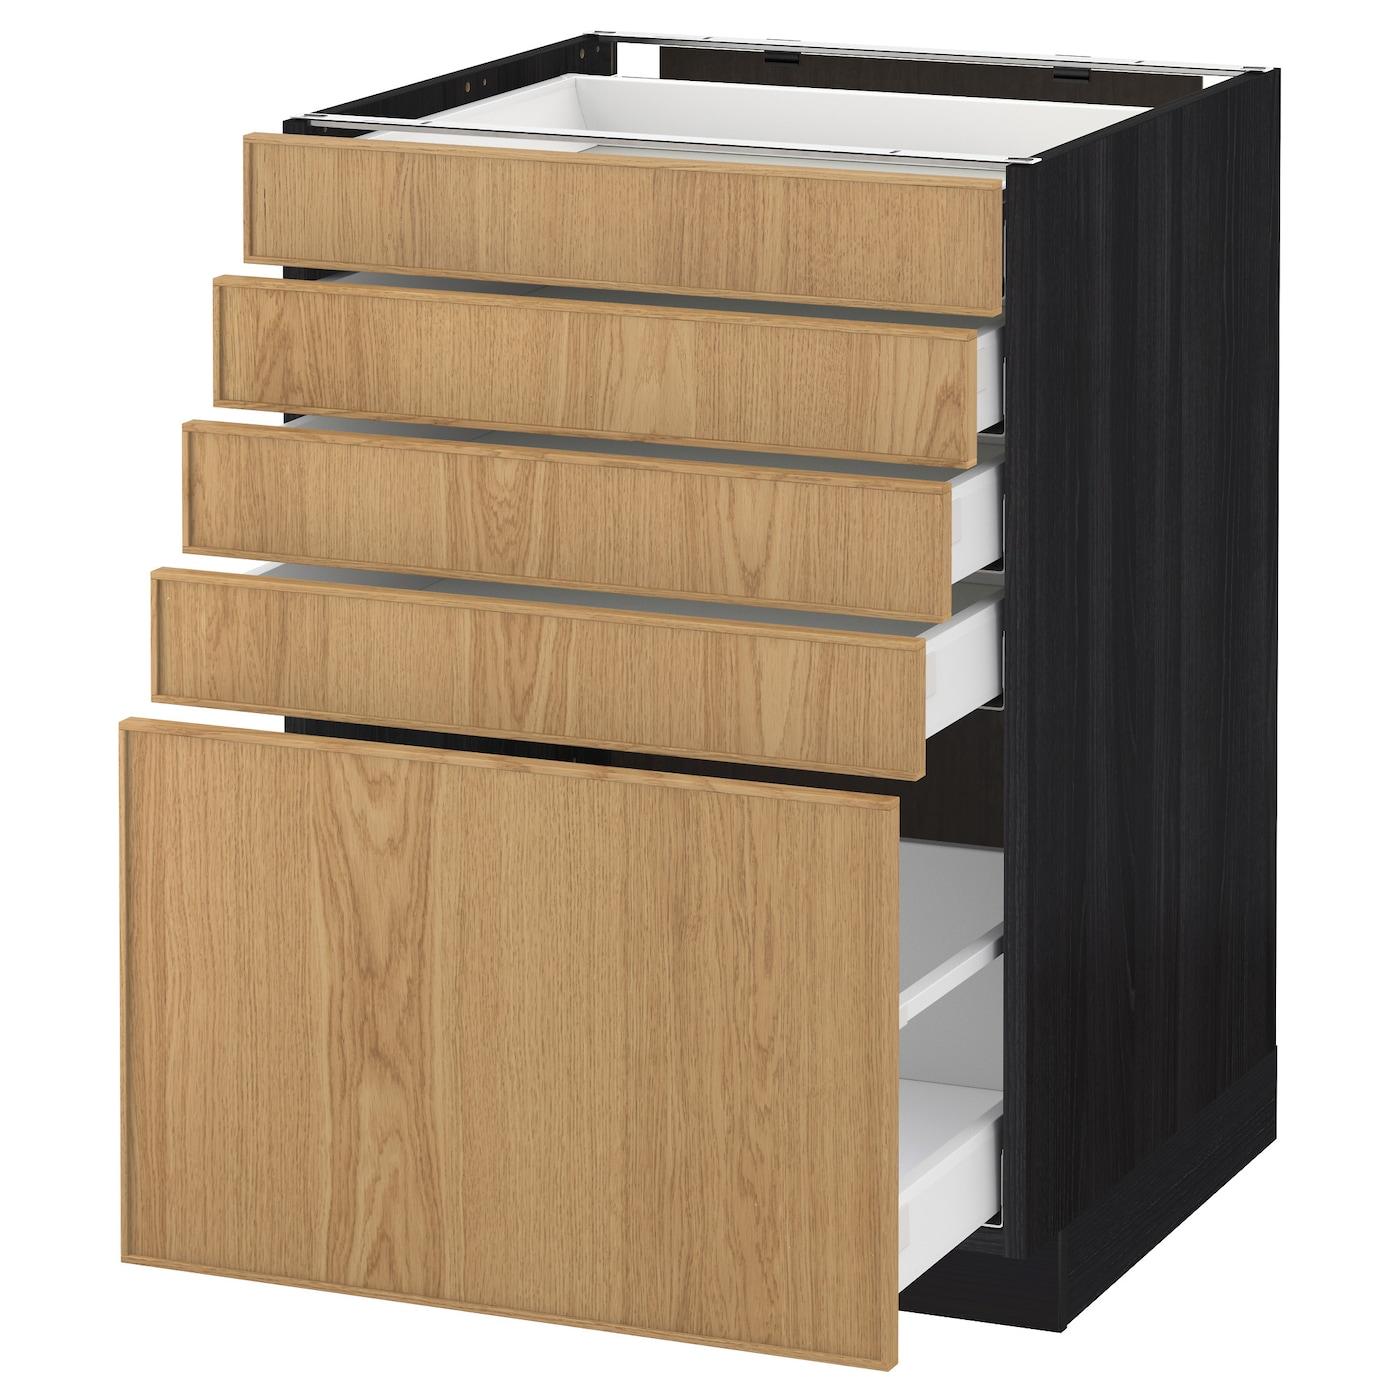 metod maximera base cabinet with 5 drawers black ekestad oak 60 x 60 cm ikea. Black Bedroom Furniture Sets. Home Design Ideas